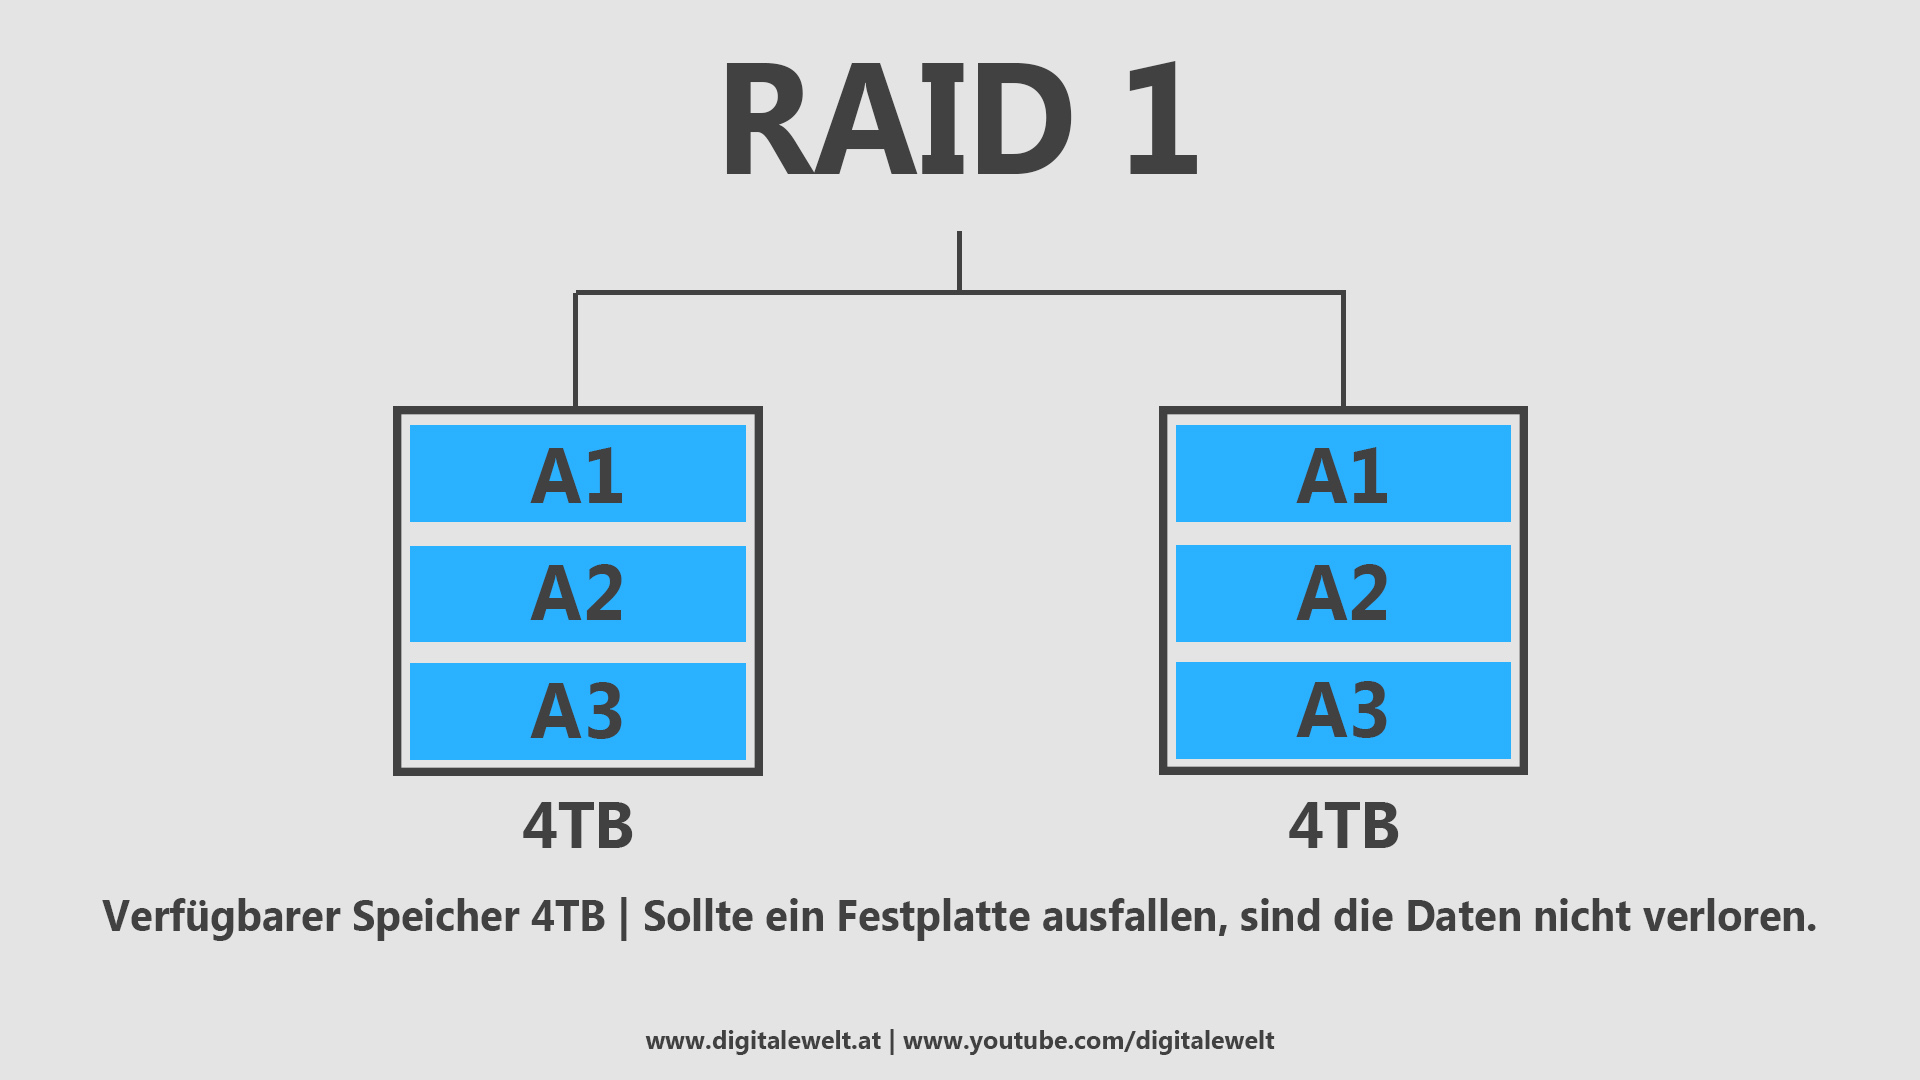 RAID-Systeme - RAID 1